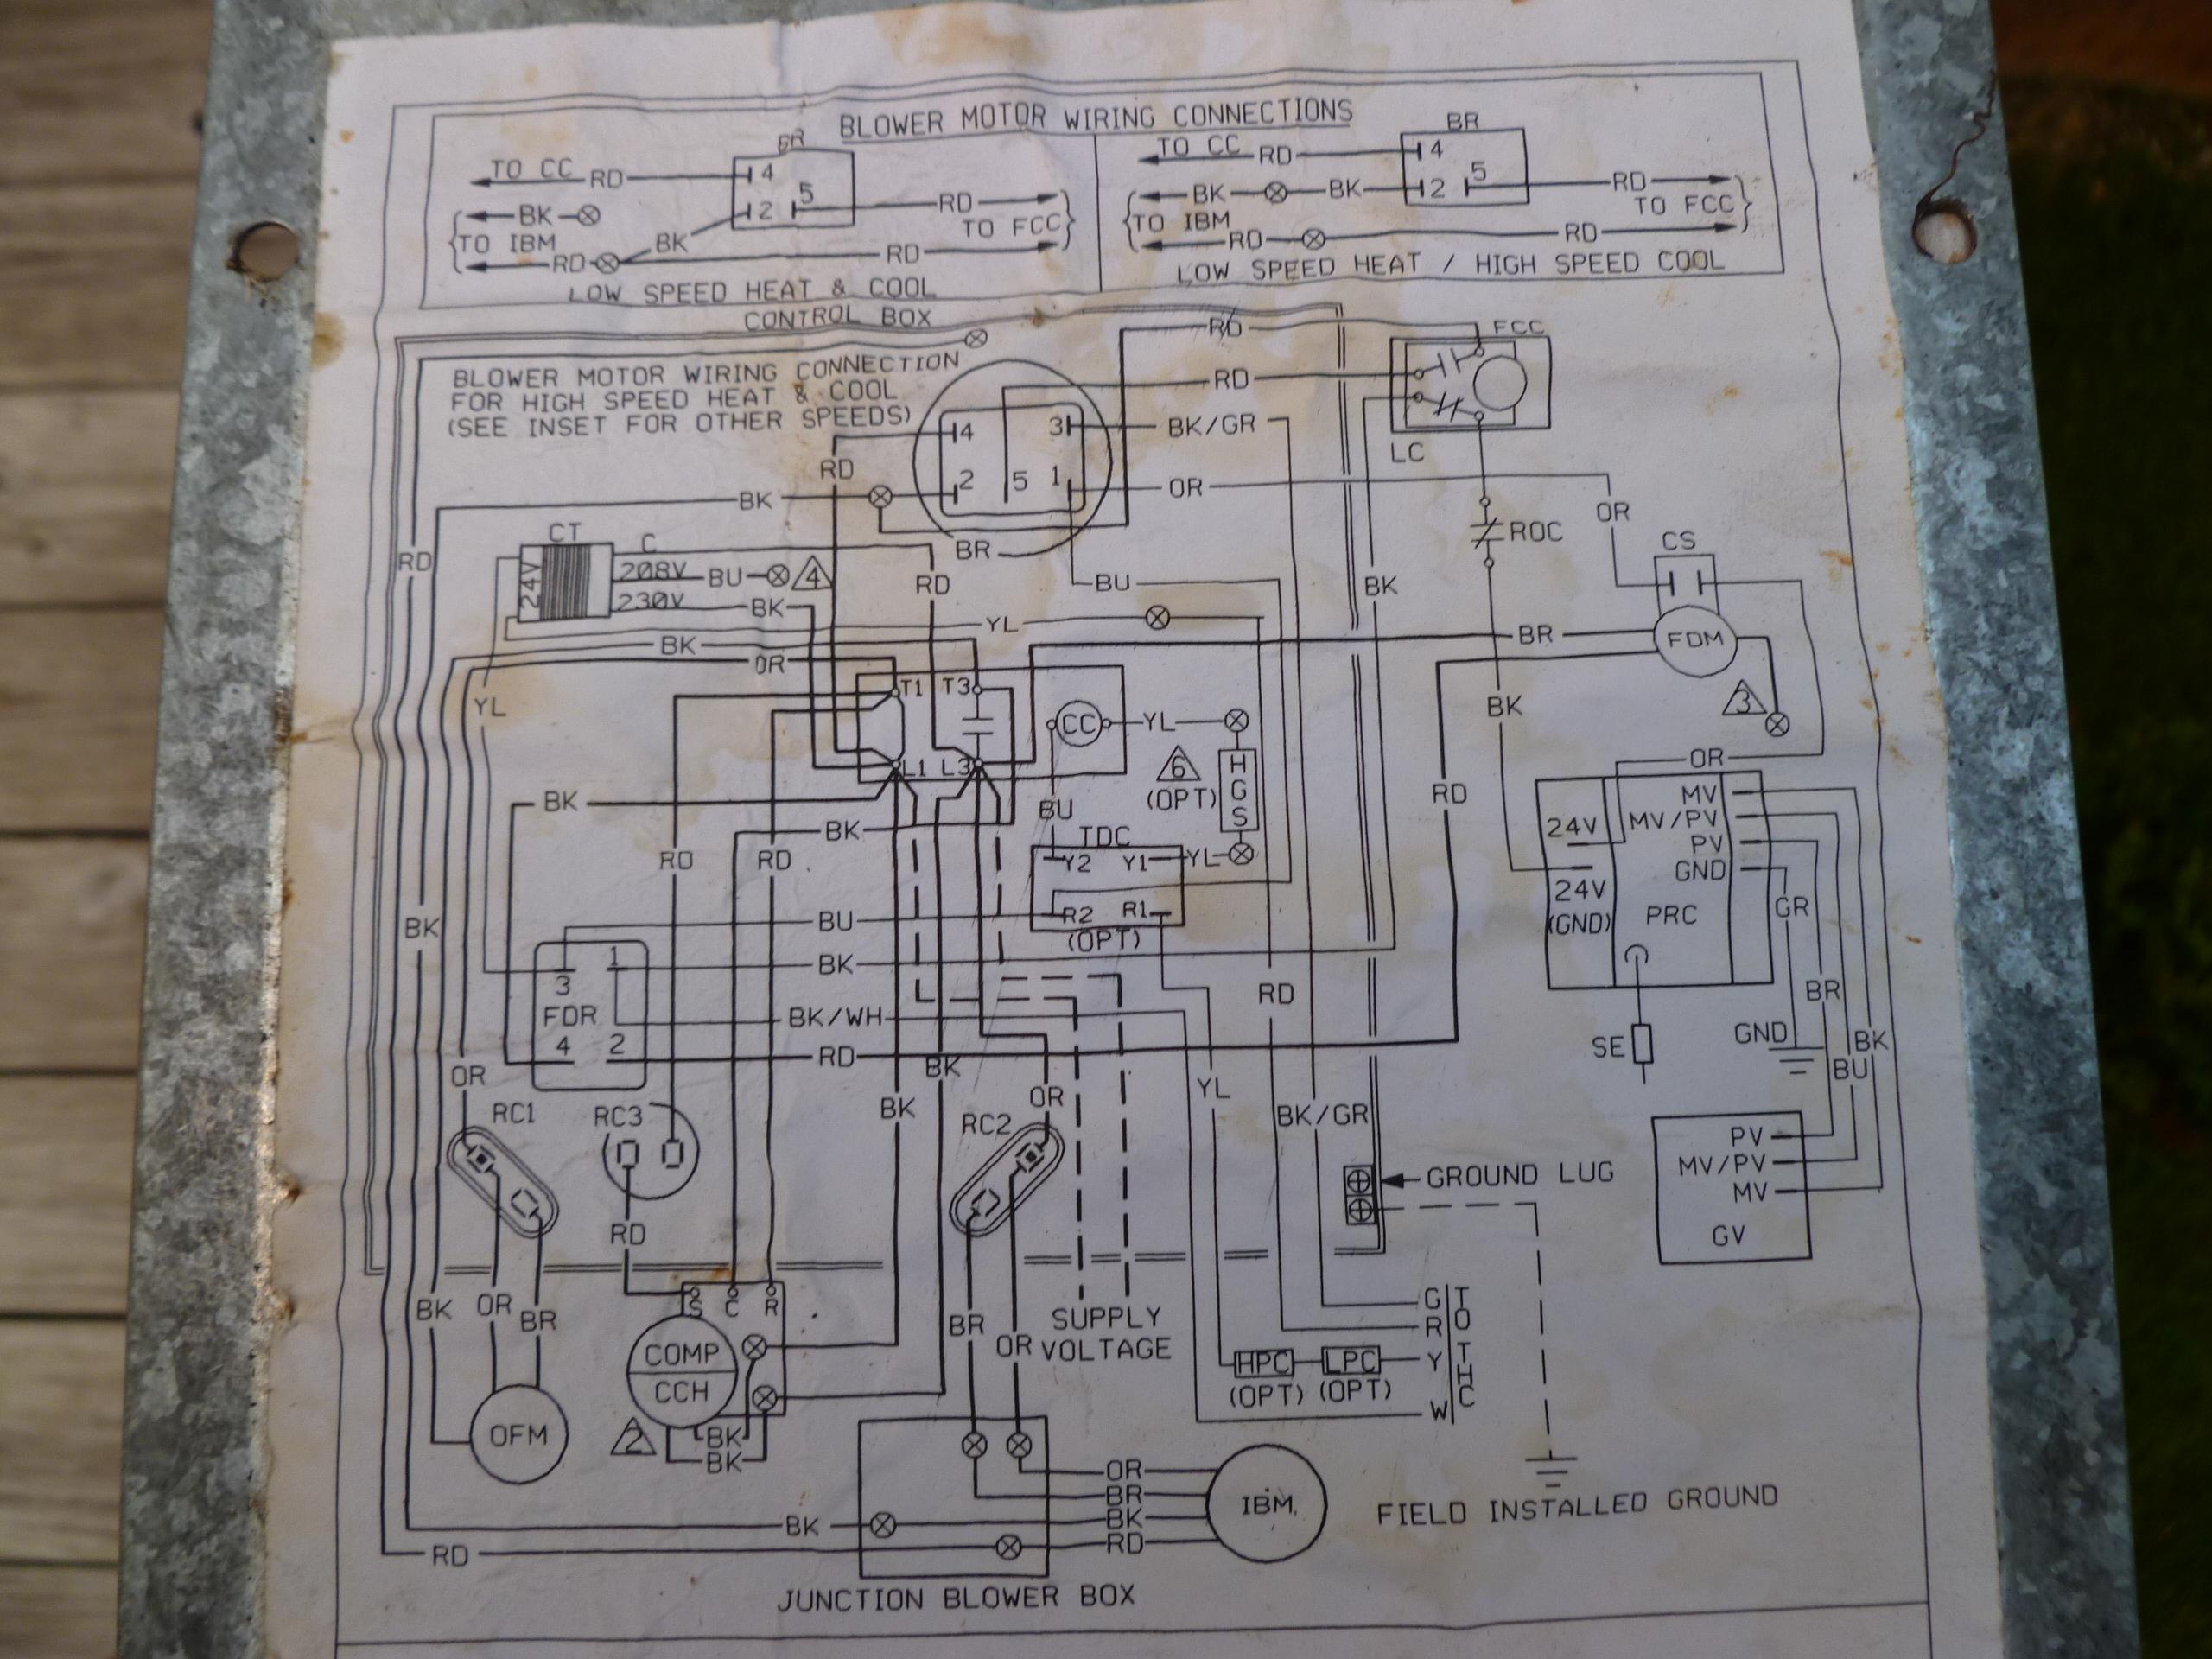 Rheem Gas Pack Wiring Diagram - Find Wiring Diagram • on wall furnace wiring diagram, heat pump wiring diagram, fan wiring diagram, heating wiring diagram, solar wiring diagram, central air wiring diagram, thermostat wiring diagram, floor furnace wiring diagram, switch wiring diagram, forced air wiring diagram, dual fuel wiring diagram, humidifier wiring diagram, air conditioning wiring diagram, tankless water heater wiring diagram, electric furnace wiring diagram, air handler wiring diagram, hot water wiring diagram,